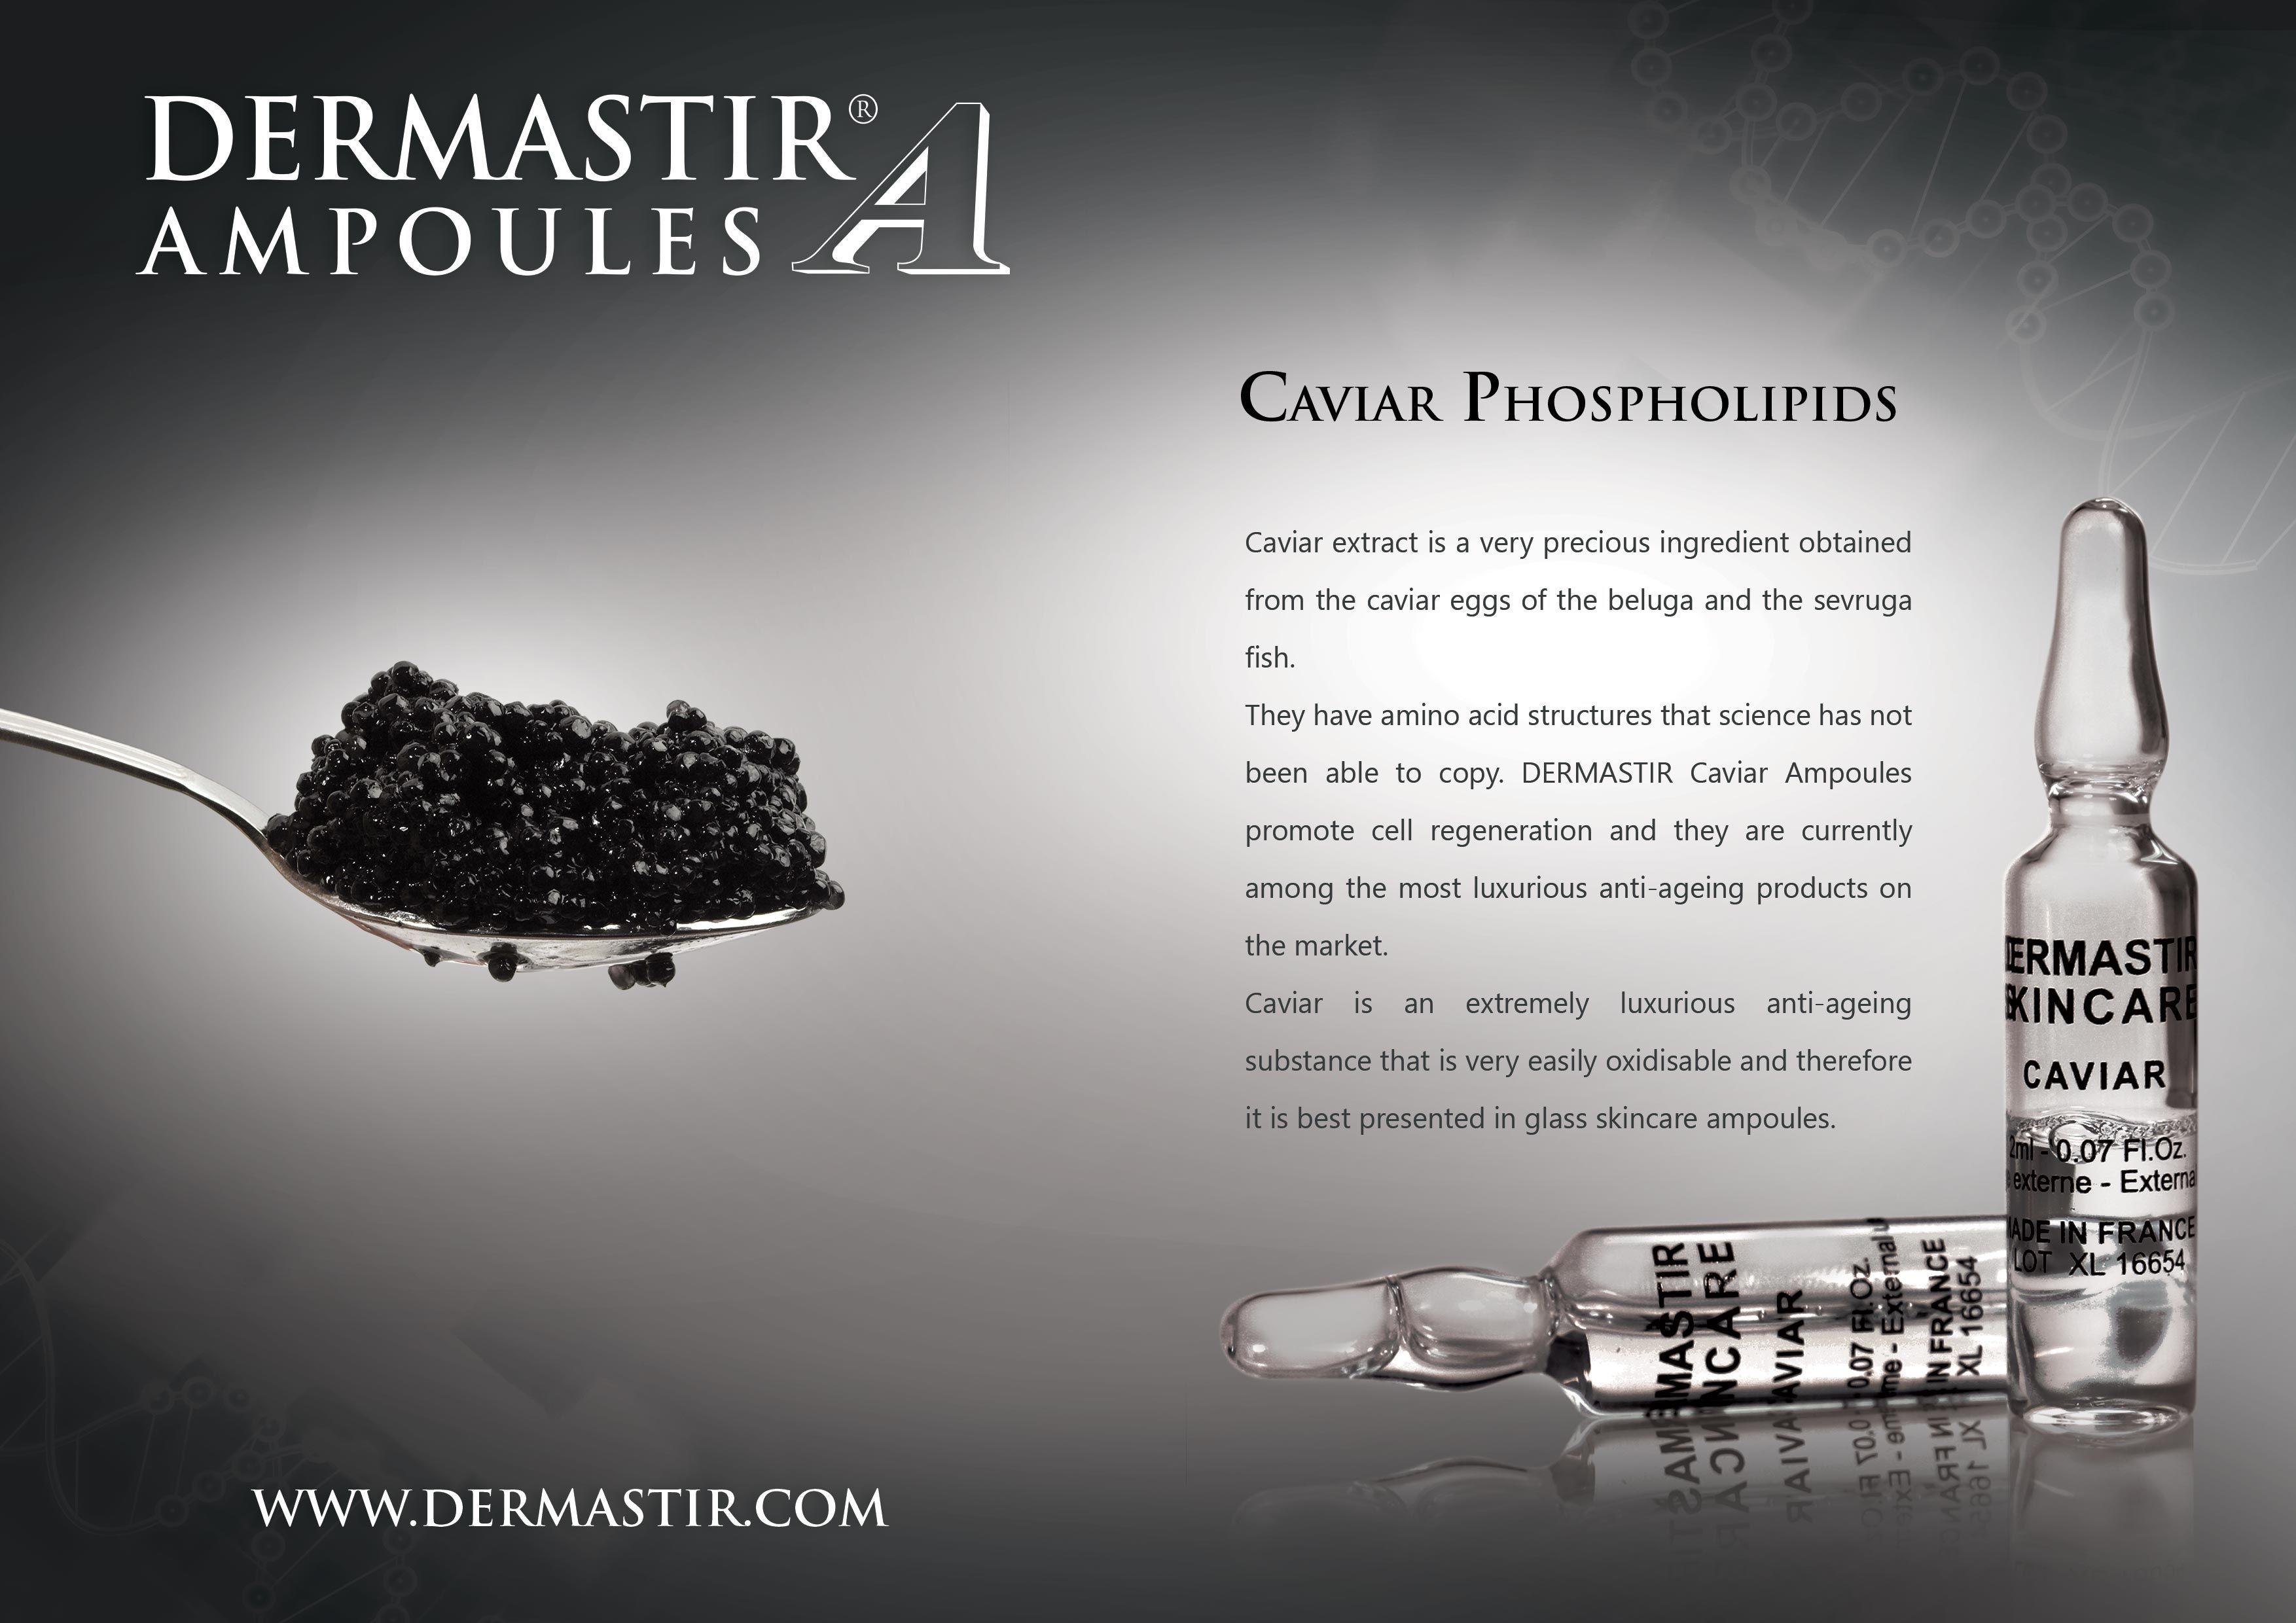 Dermastir Caviar Luxury skincare Ampoules by Alta Care Laboratoires